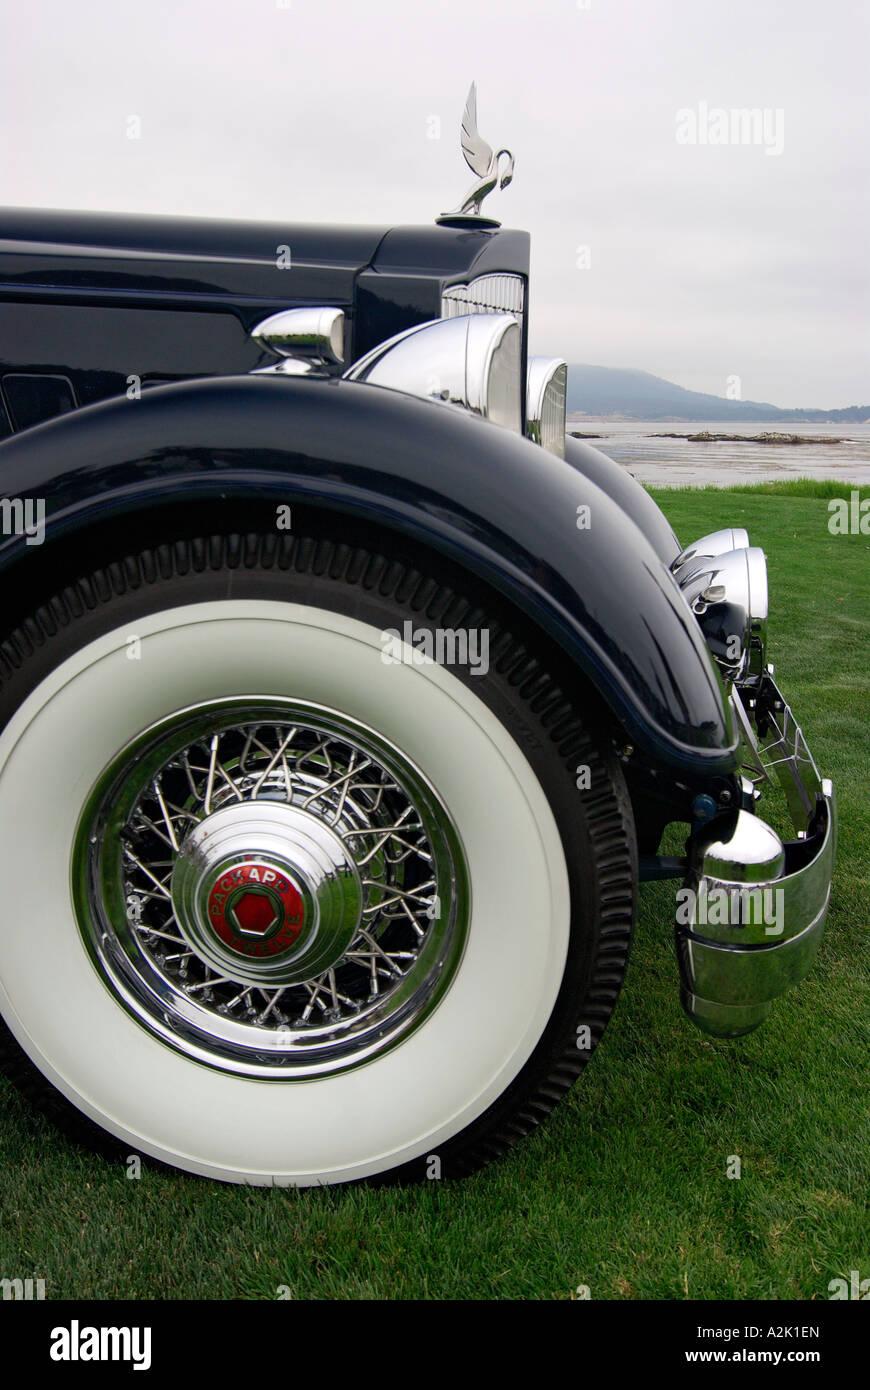 'Packard ^convertible ^1930s, ^prizewinner, 'Pebble Beach Concourse d'Elegance', California' - Stock Image